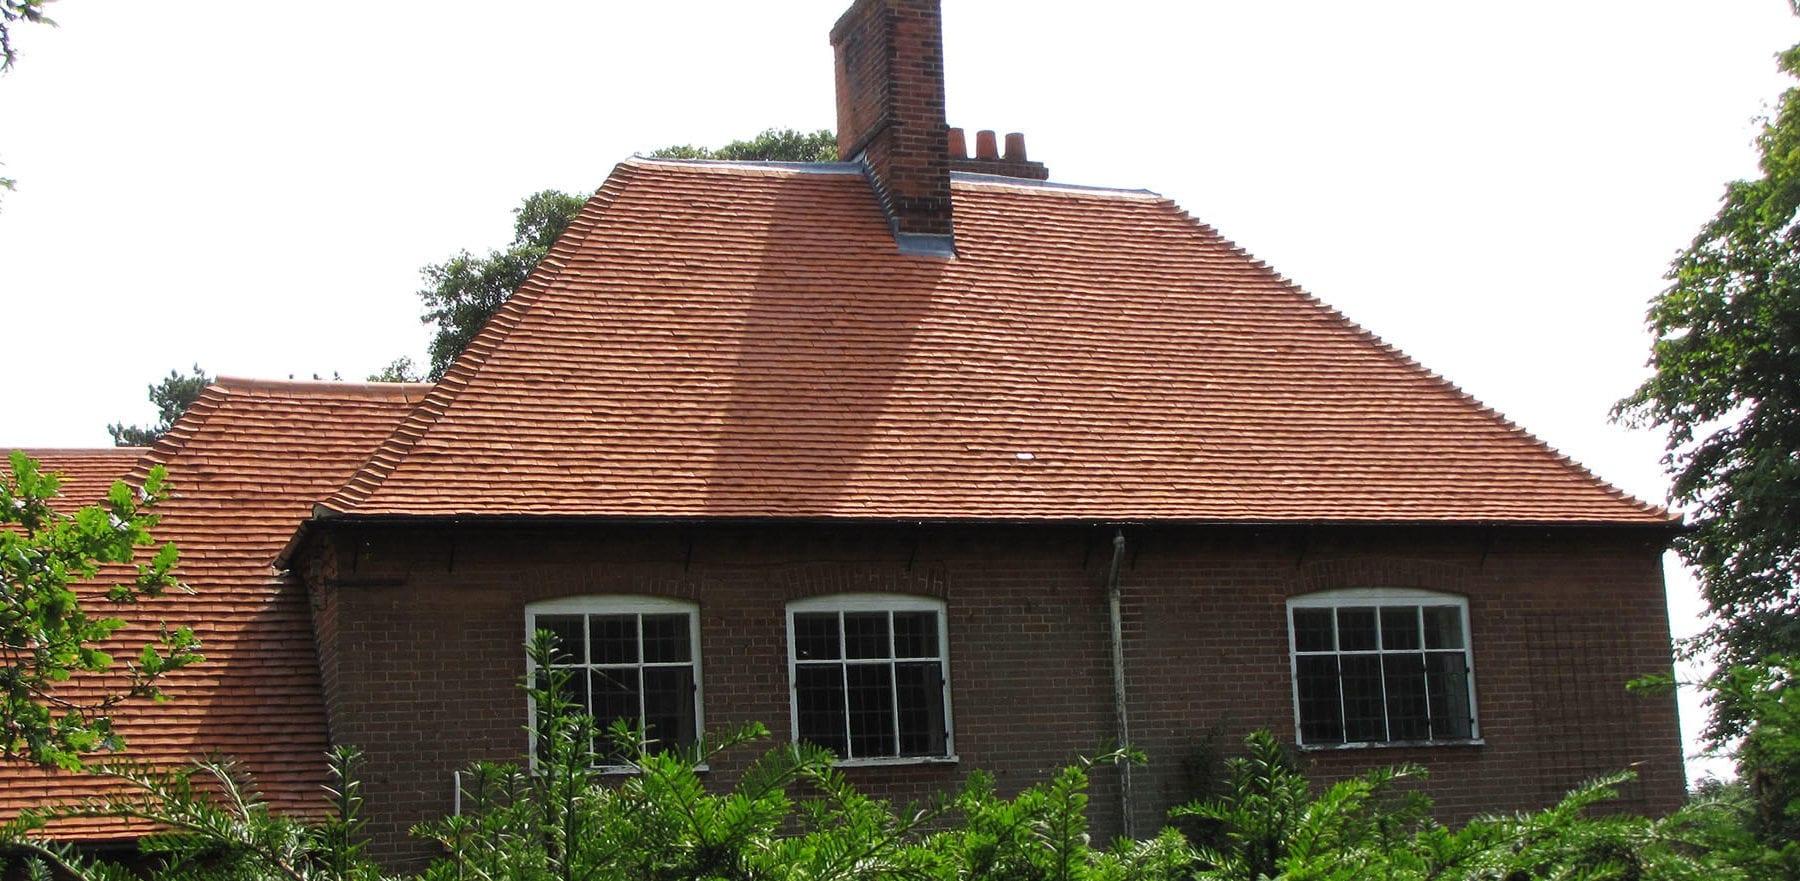 Lifestiles - Handcrafted Orange Clay Roof Tiles - Wisset Hall, England 4